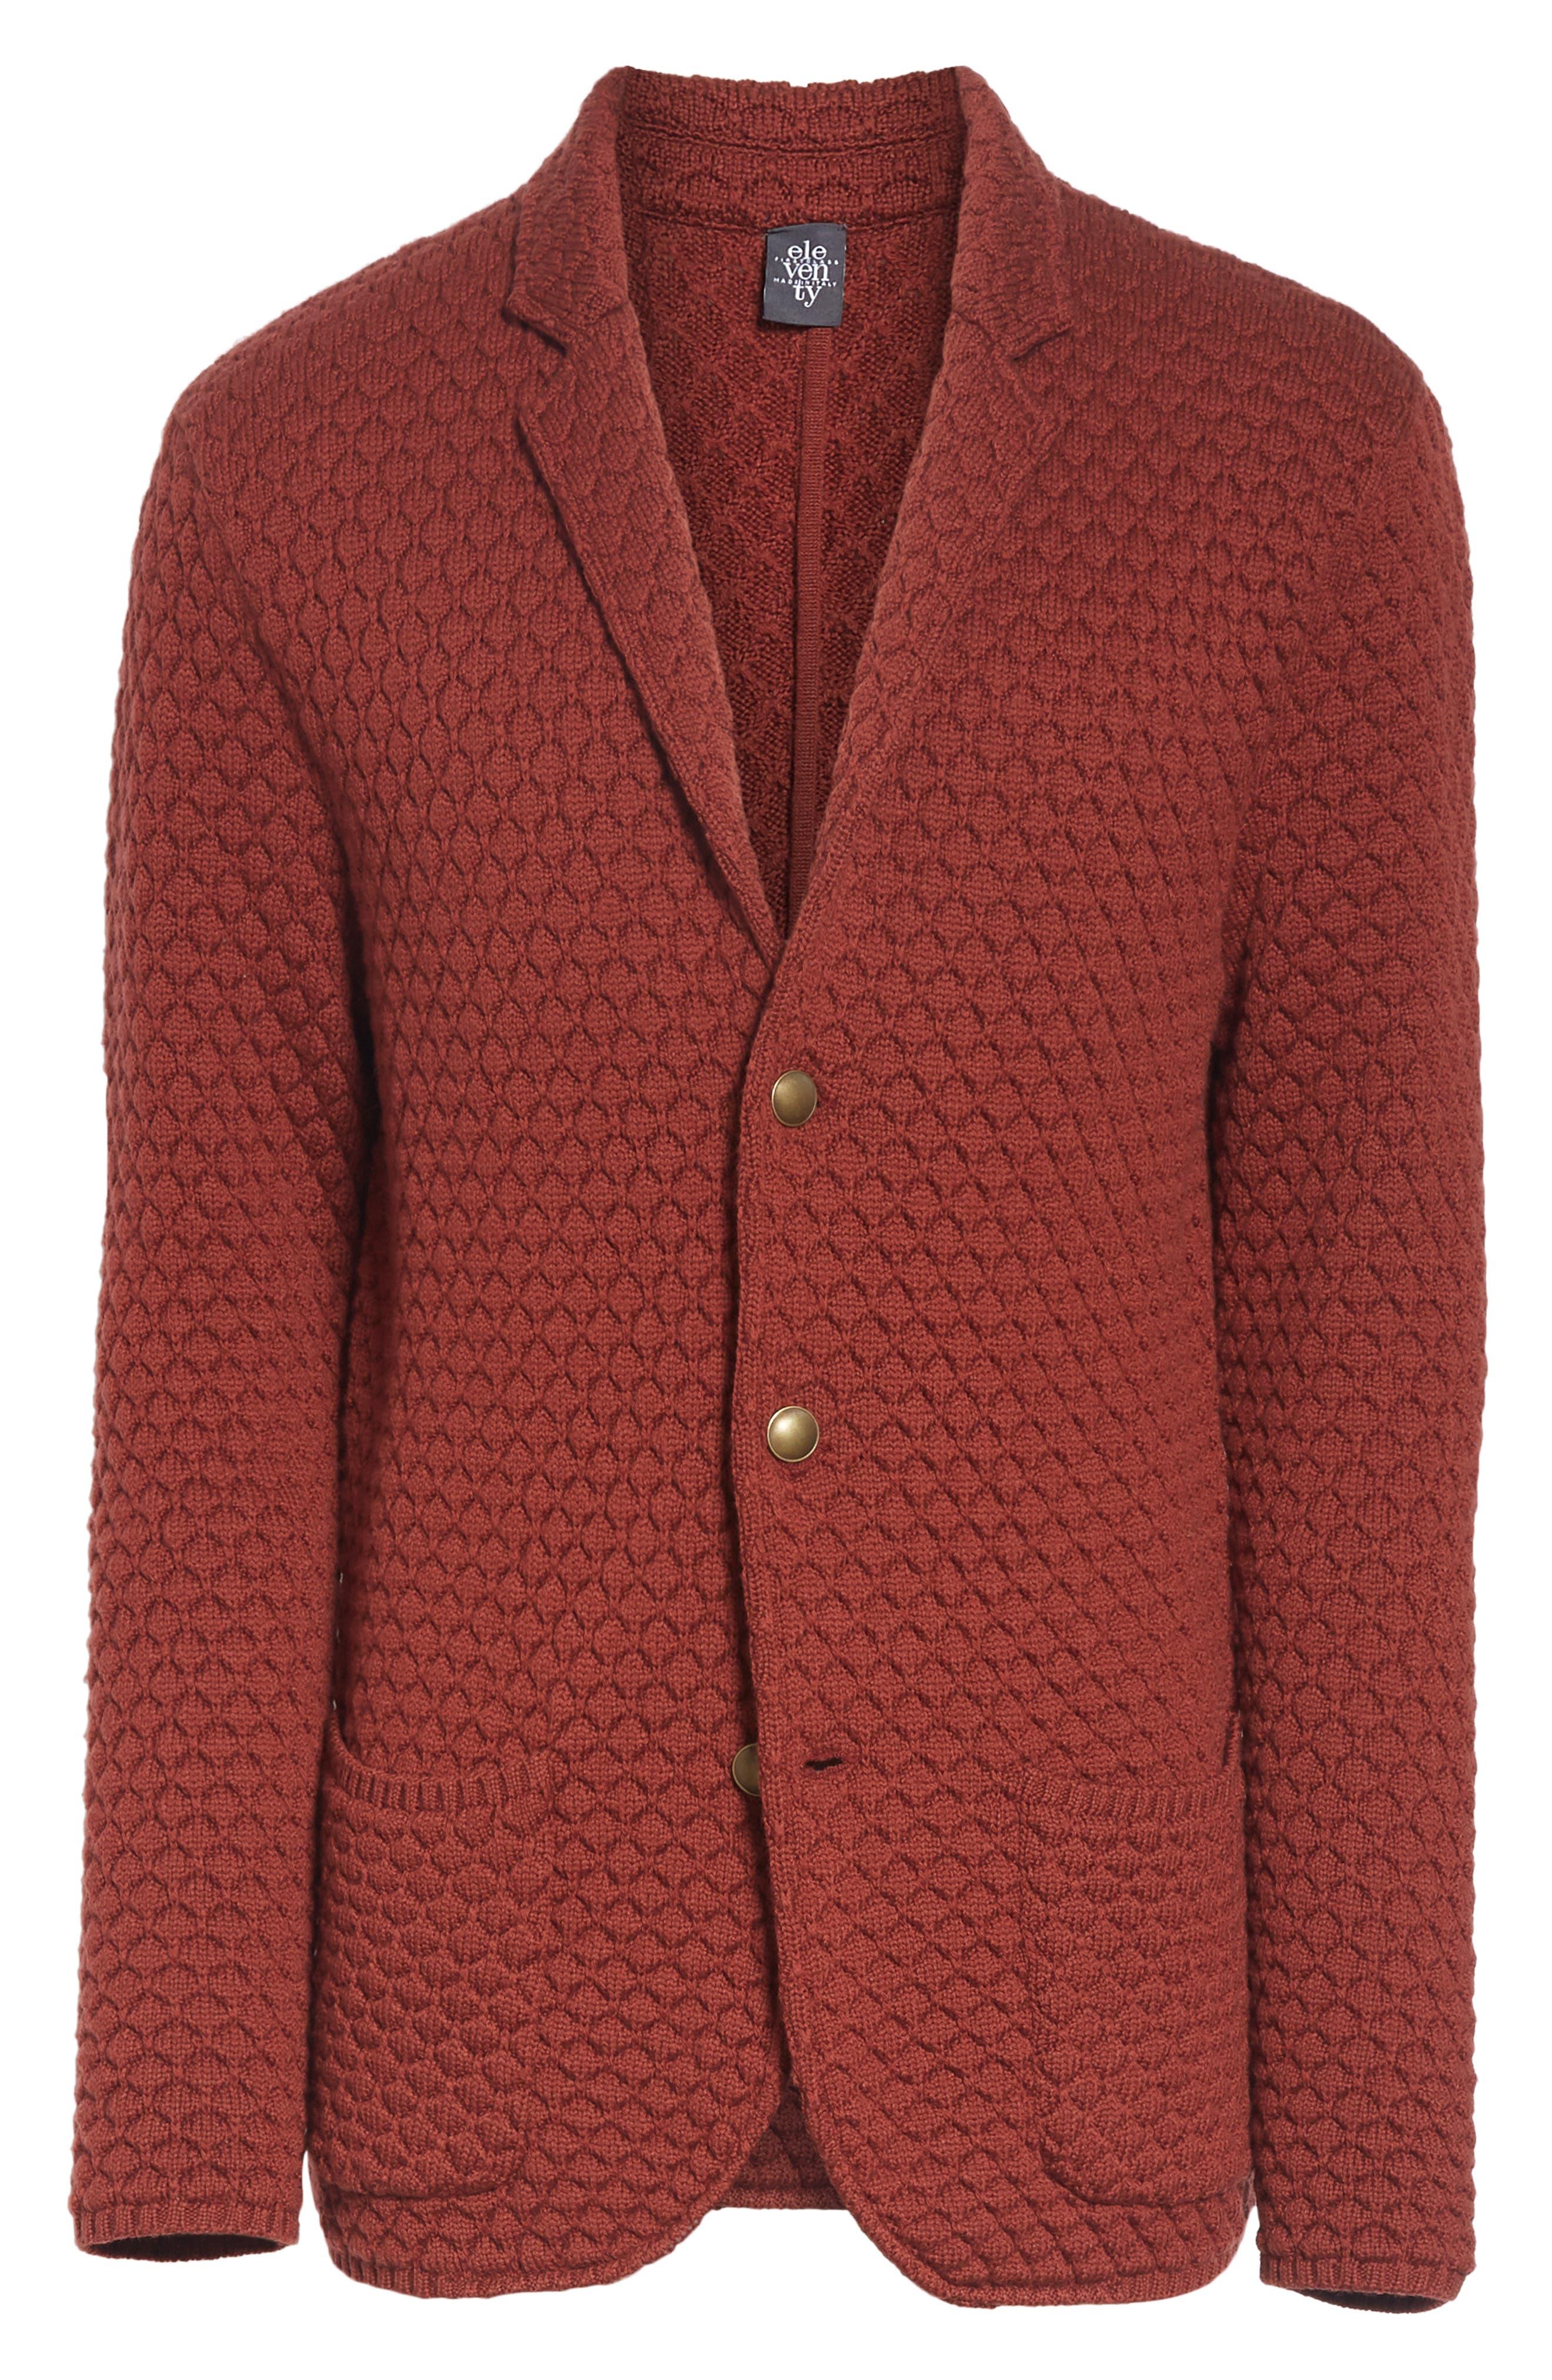 Wool Sweater Jacket,                             Alternate thumbnail 5, color,                             223